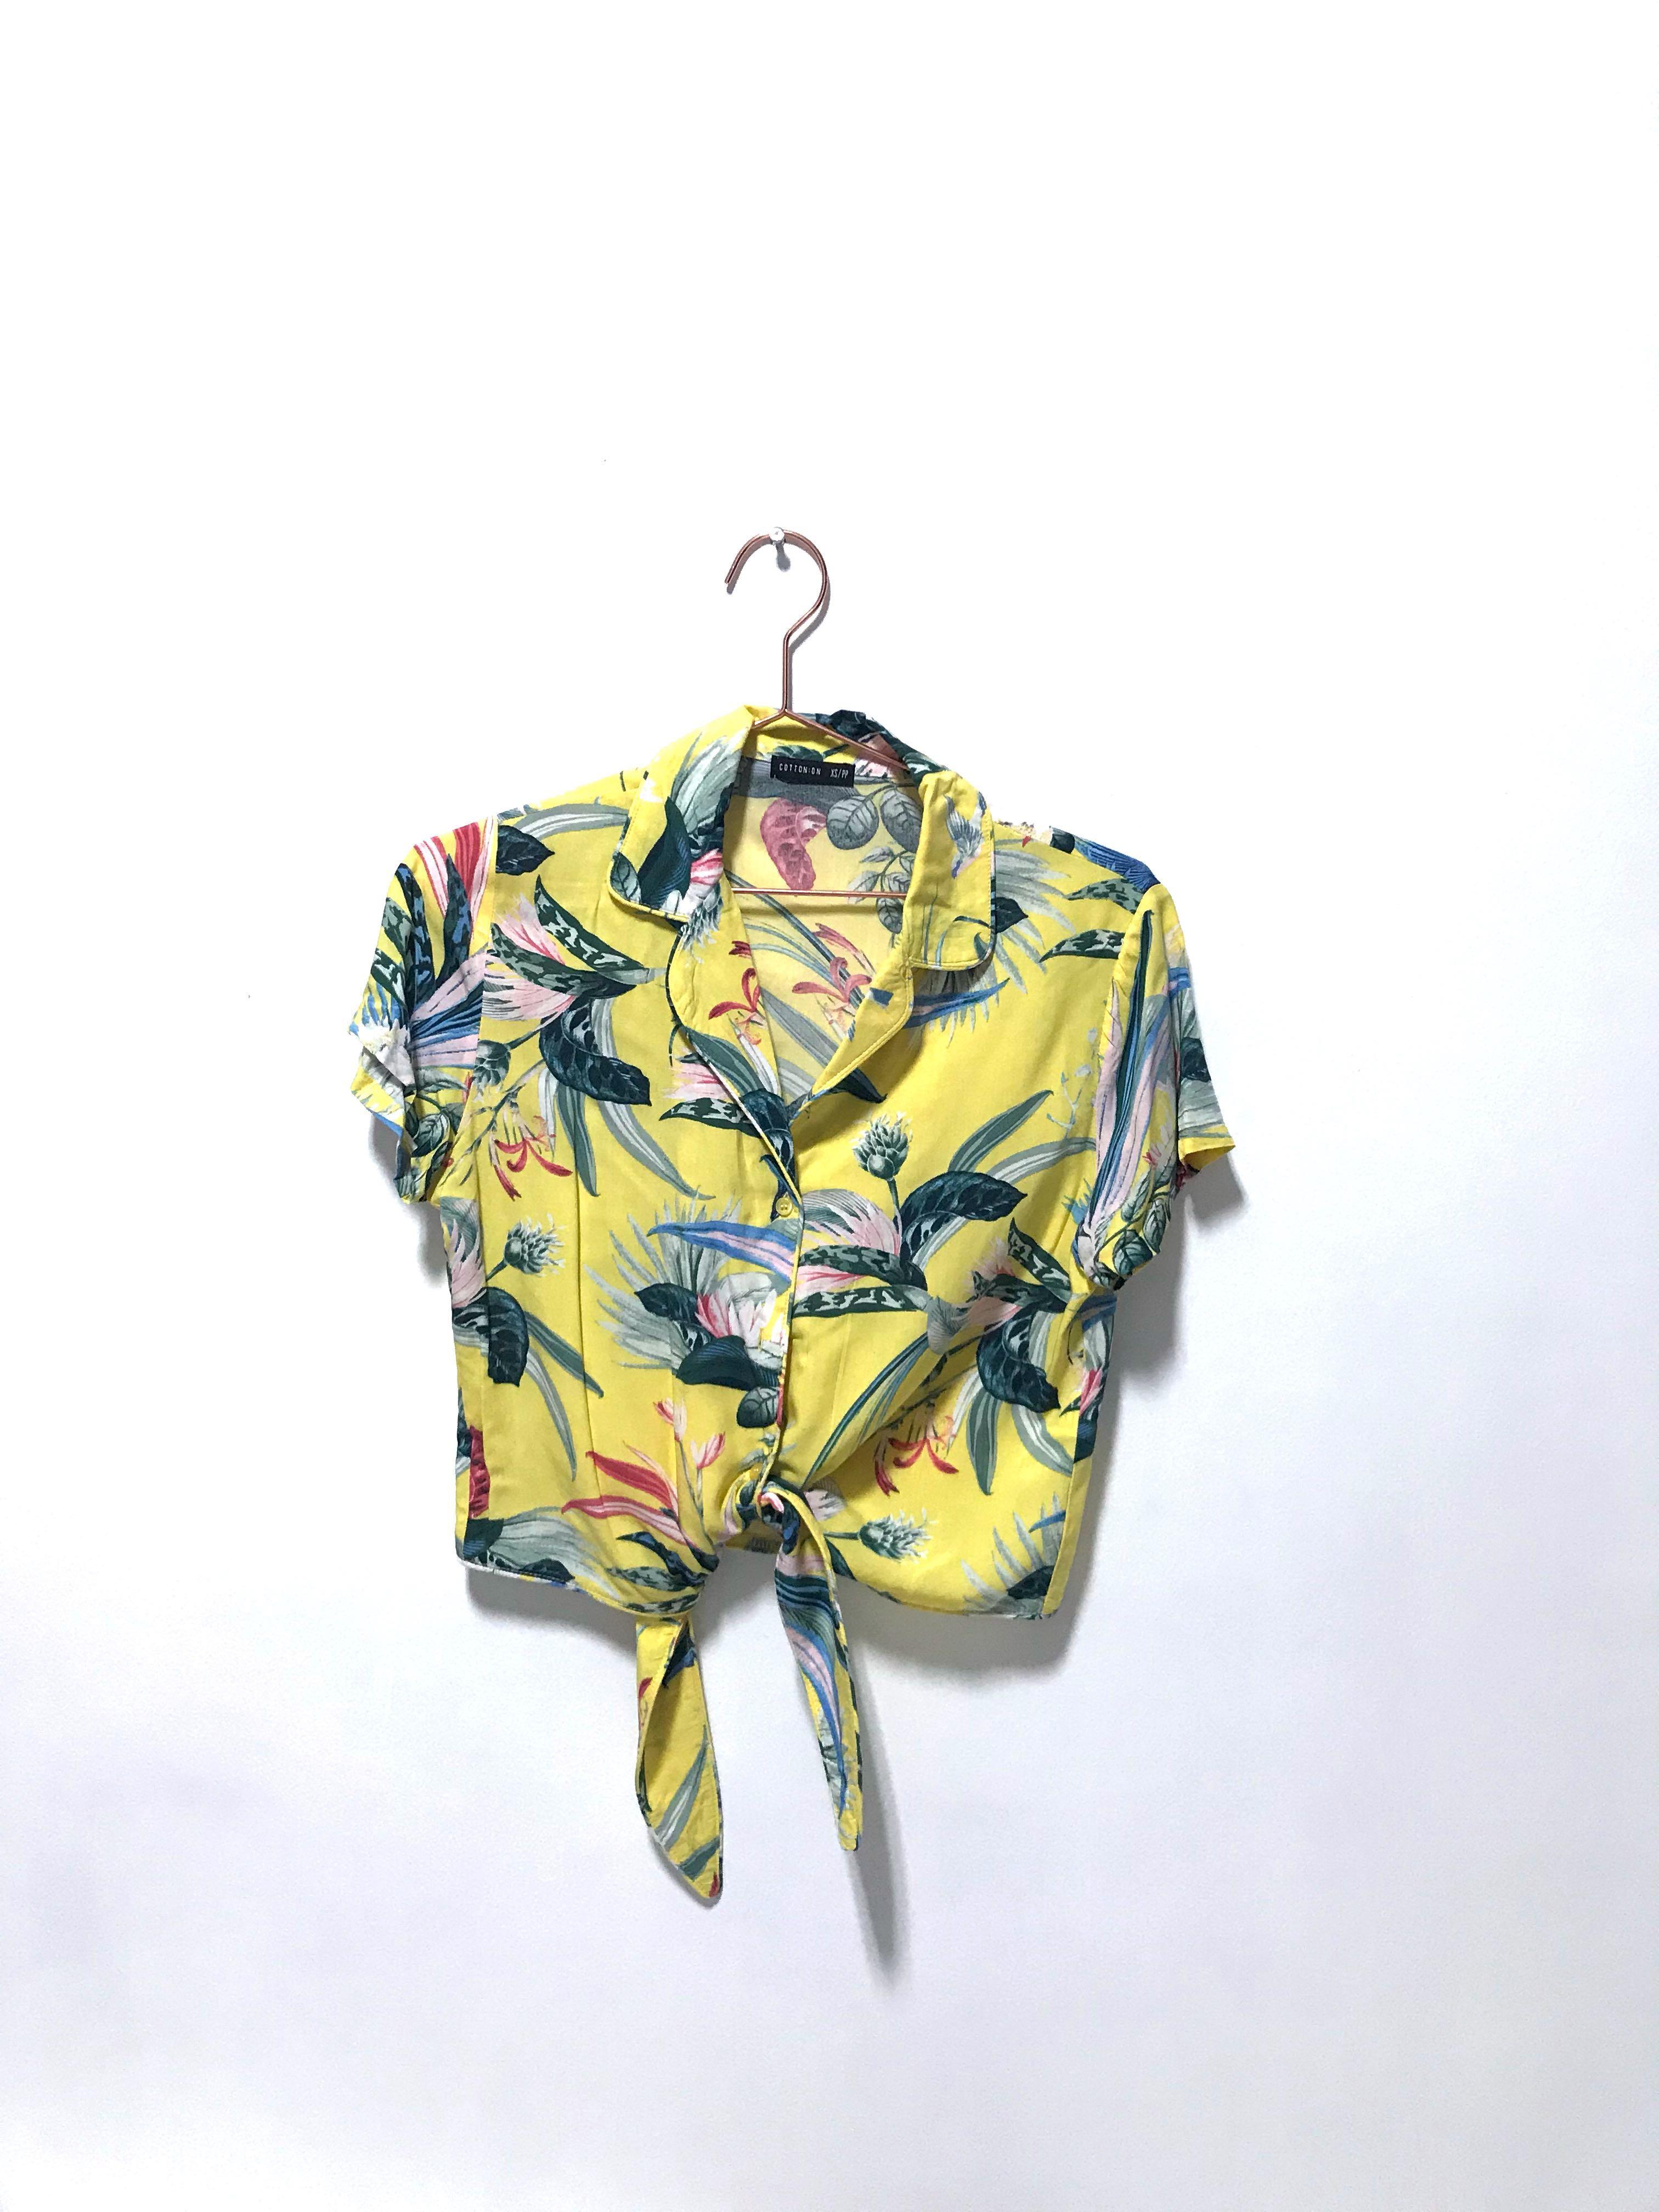 ab5ad2cc98b33 Sale) Tropical Hawaii floral yellow TOP